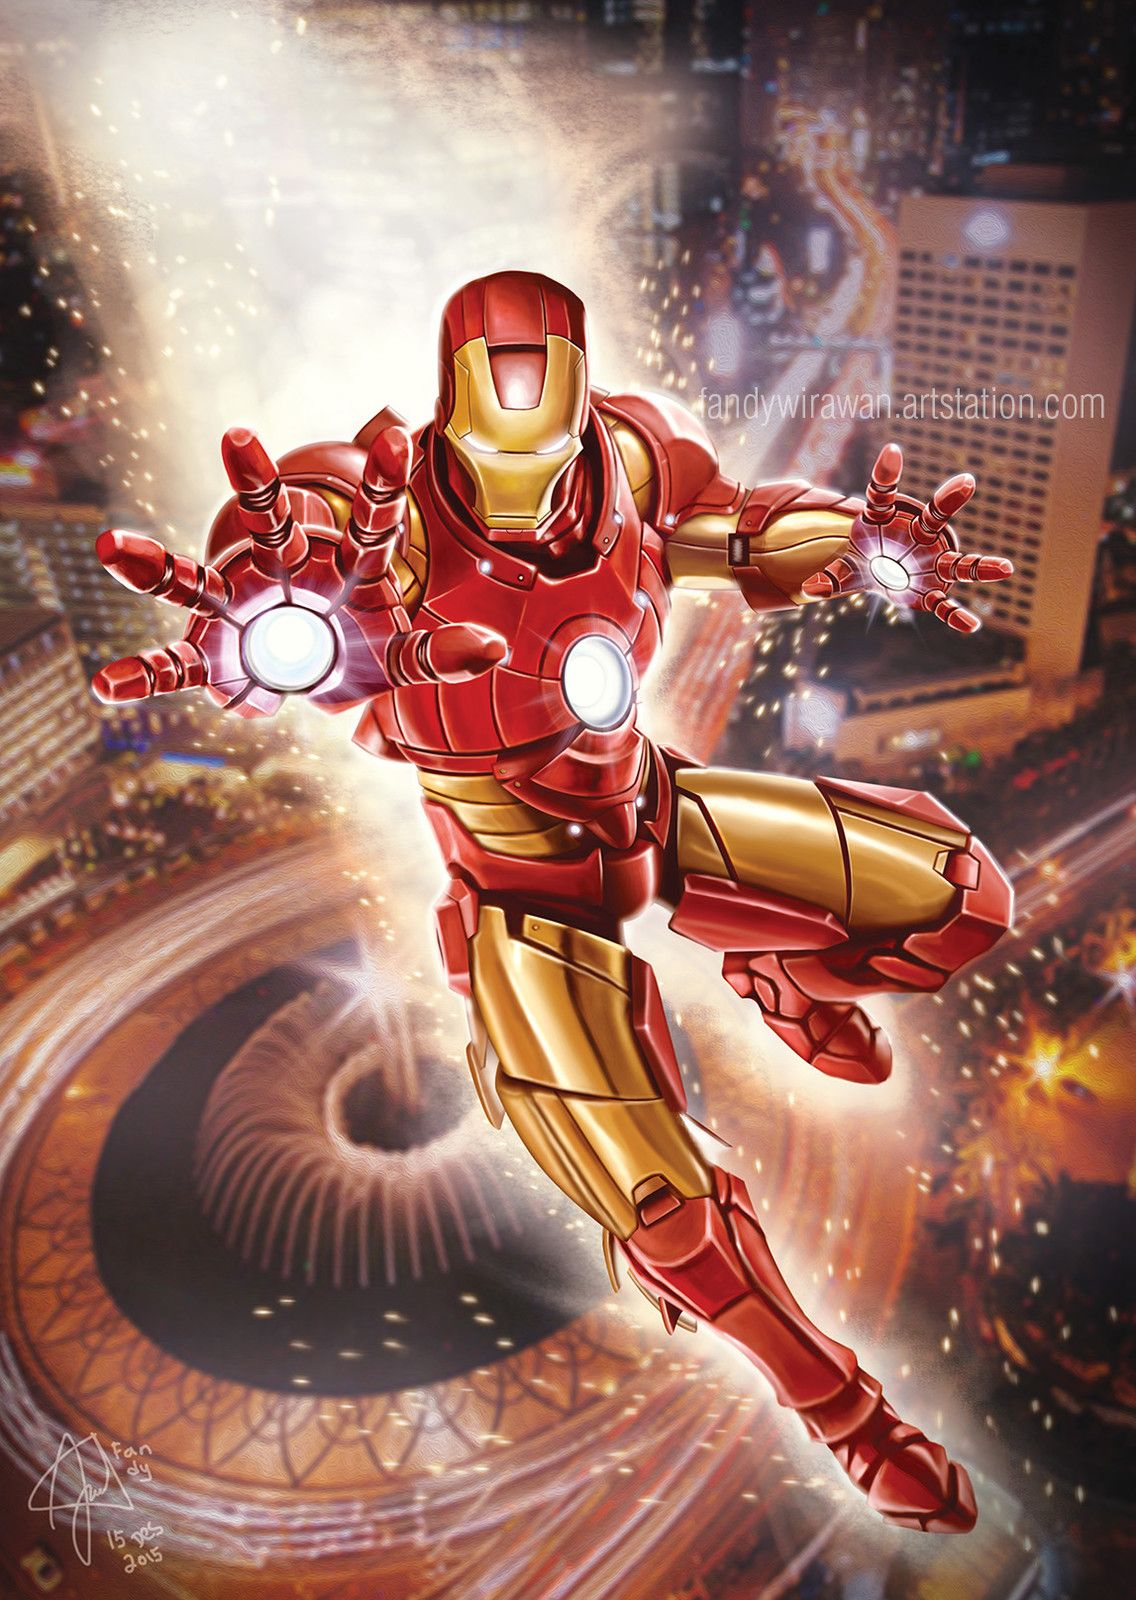 #iron #man #fan #art. Iron Man Fandy Wirawan